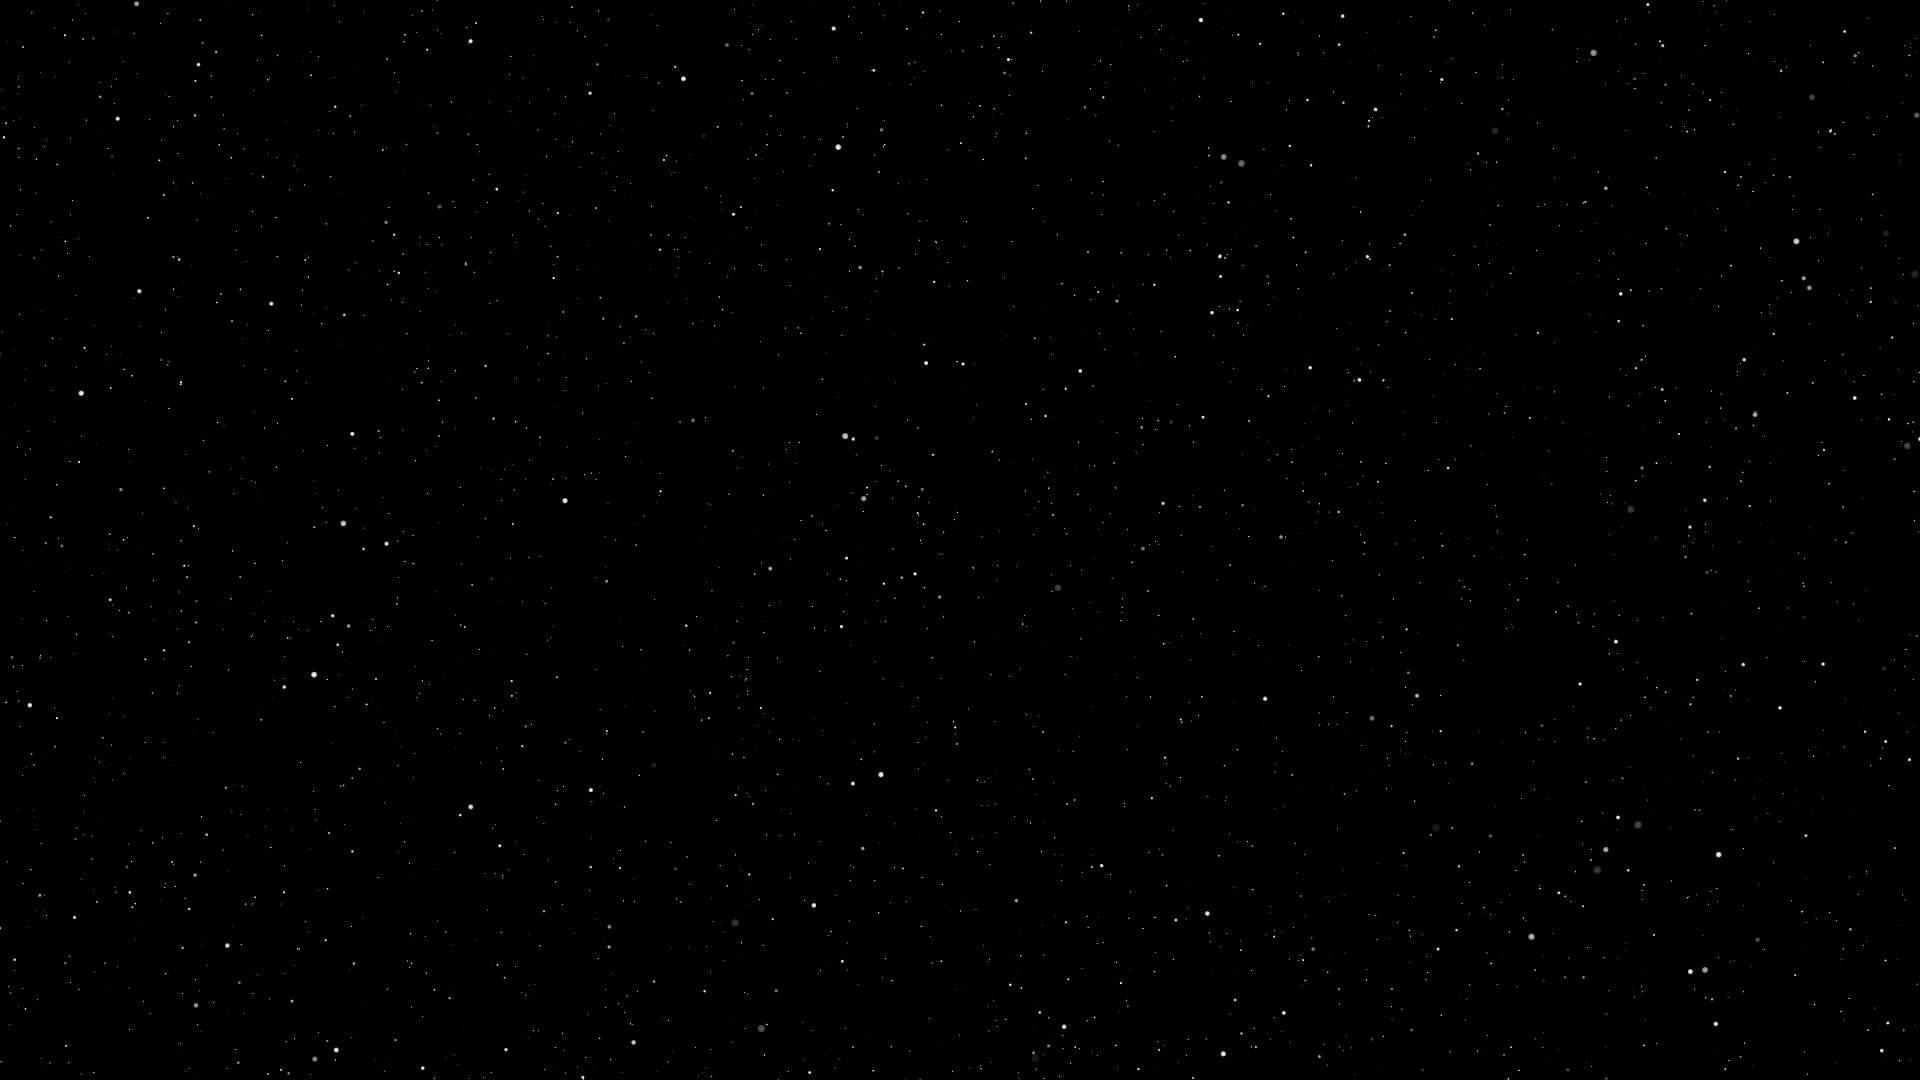 stars wallpapers 1920x1080 - photo #49